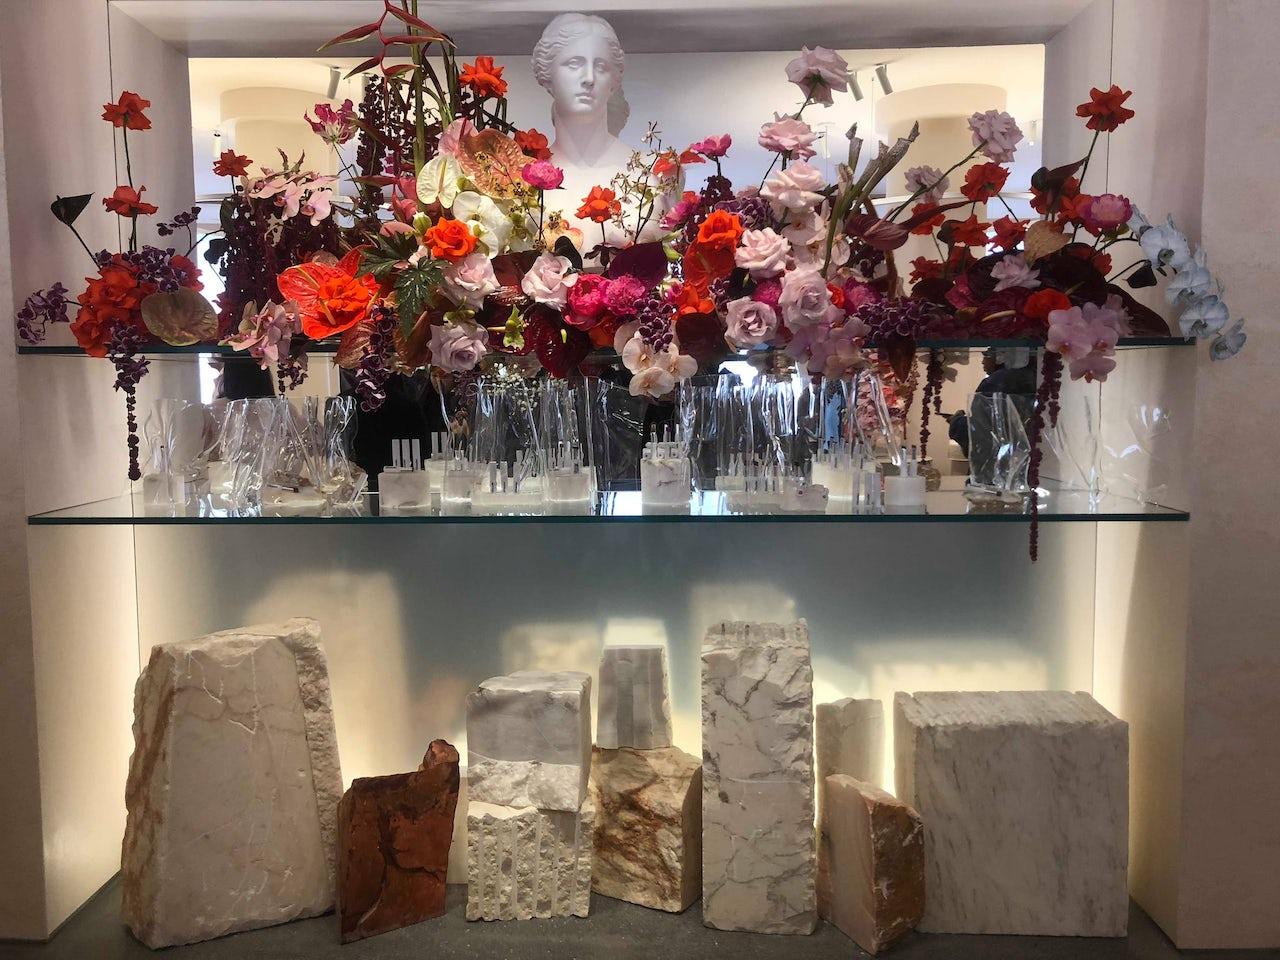 The main display of the Glossier showroom.